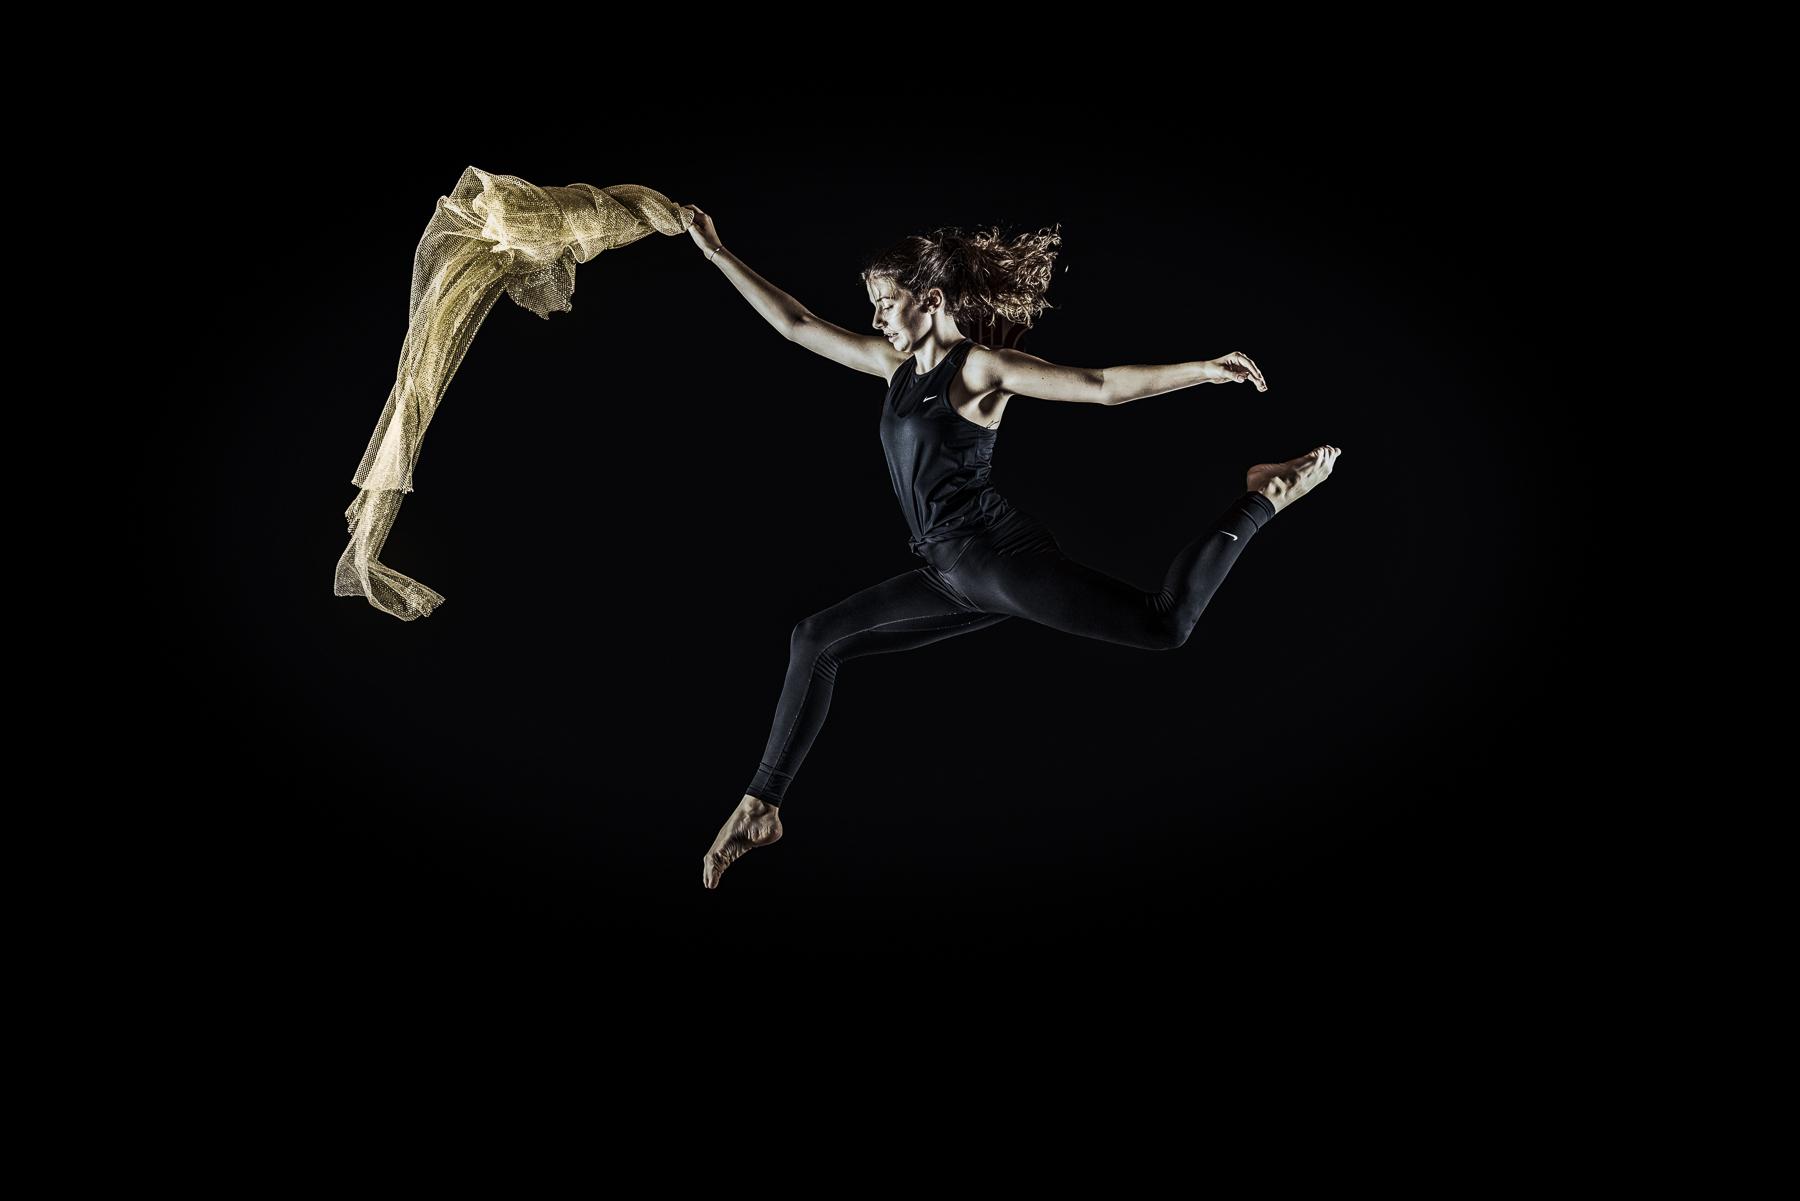 0567_Flying-Fashion_Turnerschaft-Wolfurt@Mario-Stecher-2021-Bearbeitet-Bearbeitet